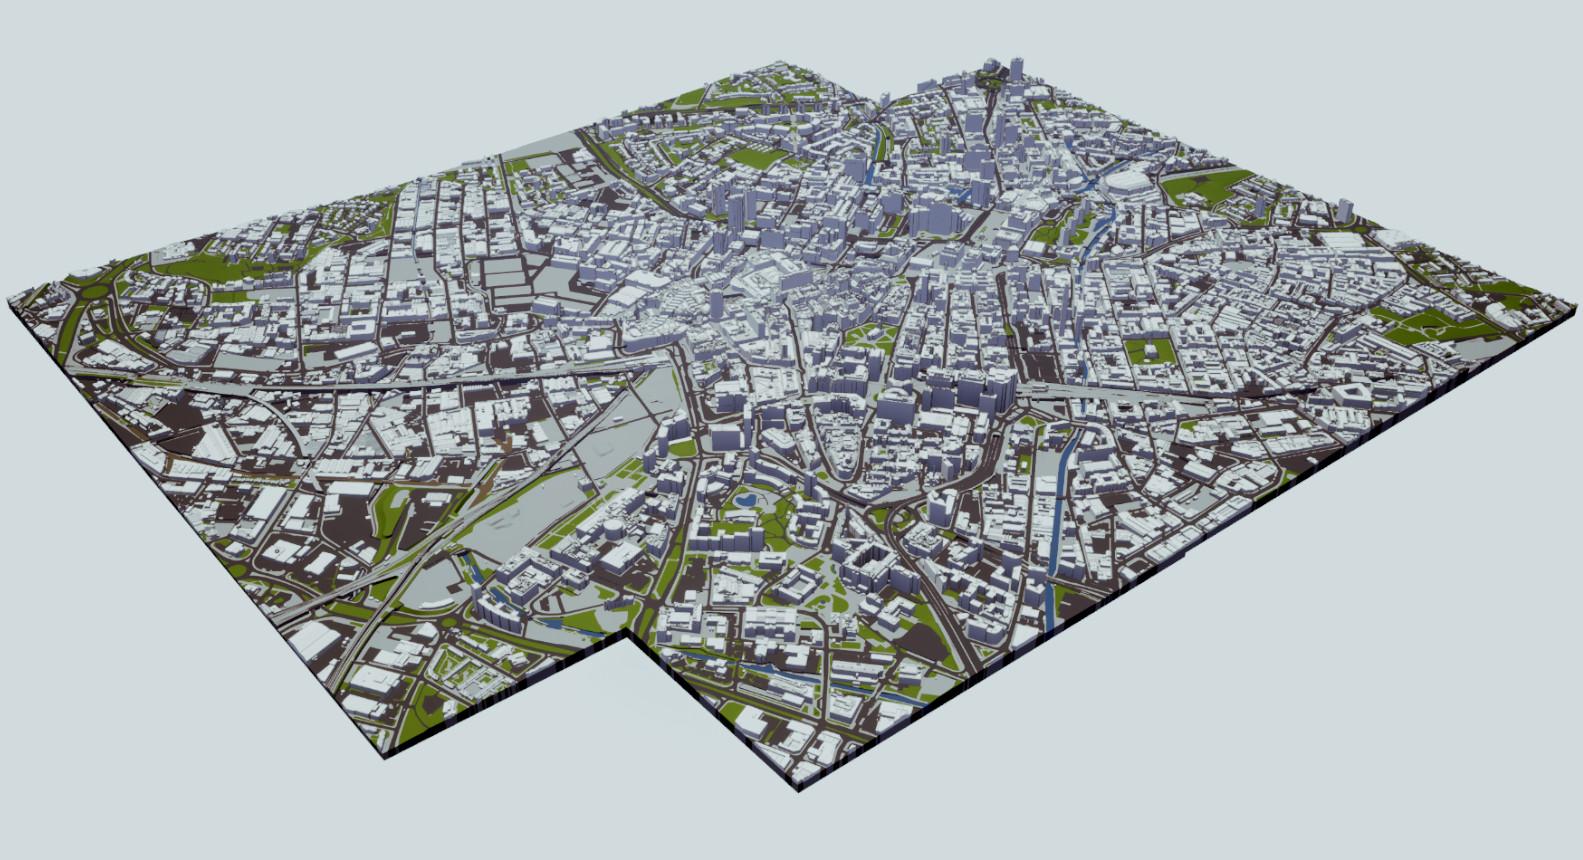 3D Model of Birmingham